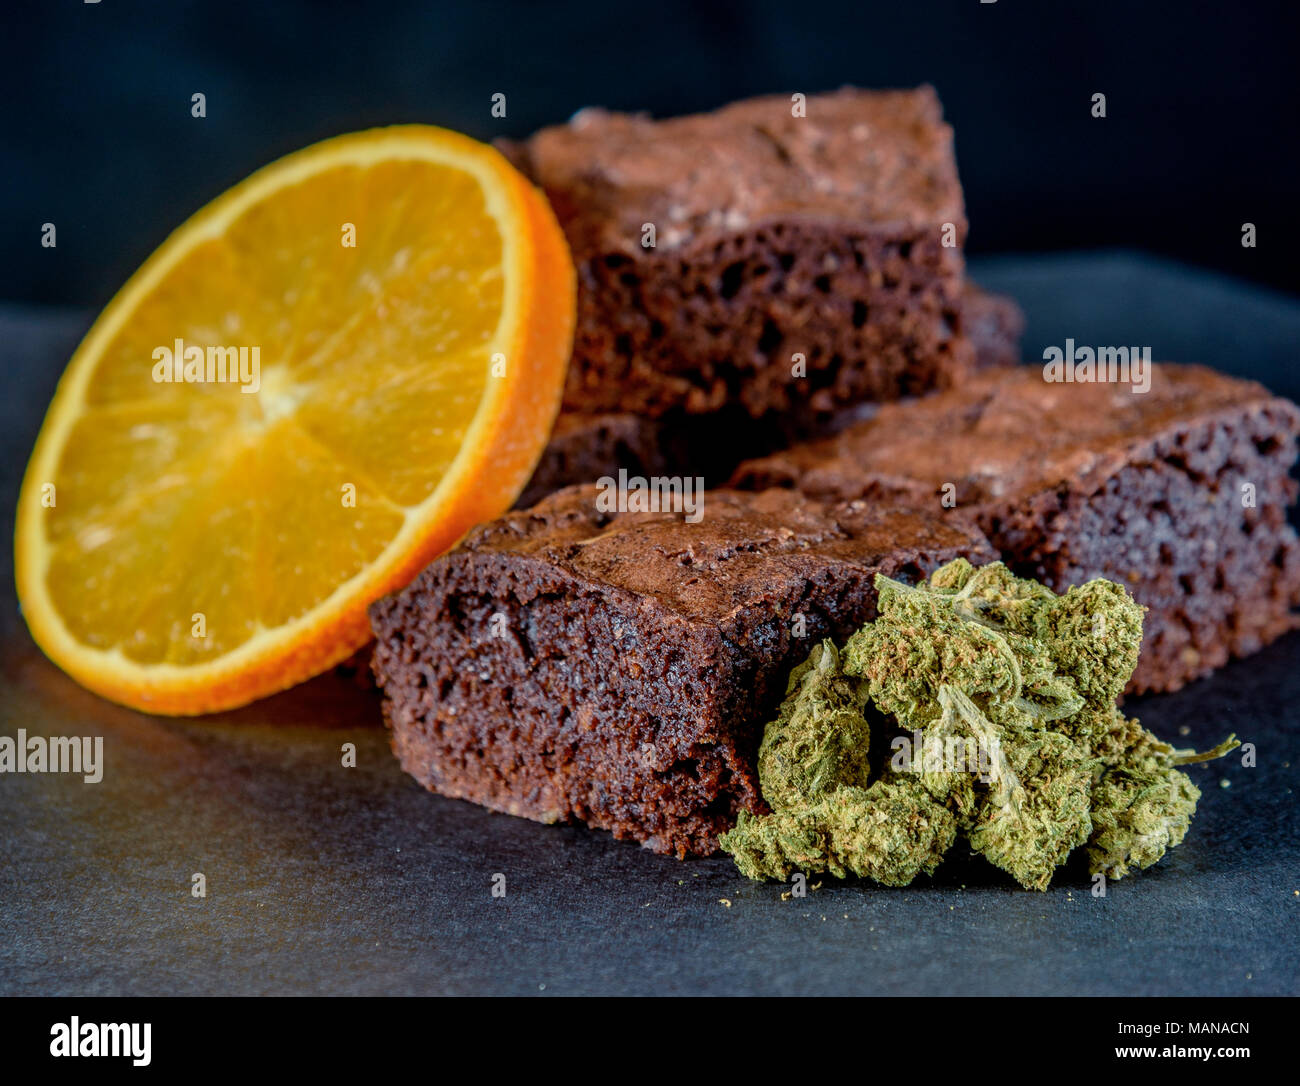 A stack of marijuana edible brownies next to a small pile of medical marijuana nugs and an orange slice. Black background - Stock Image